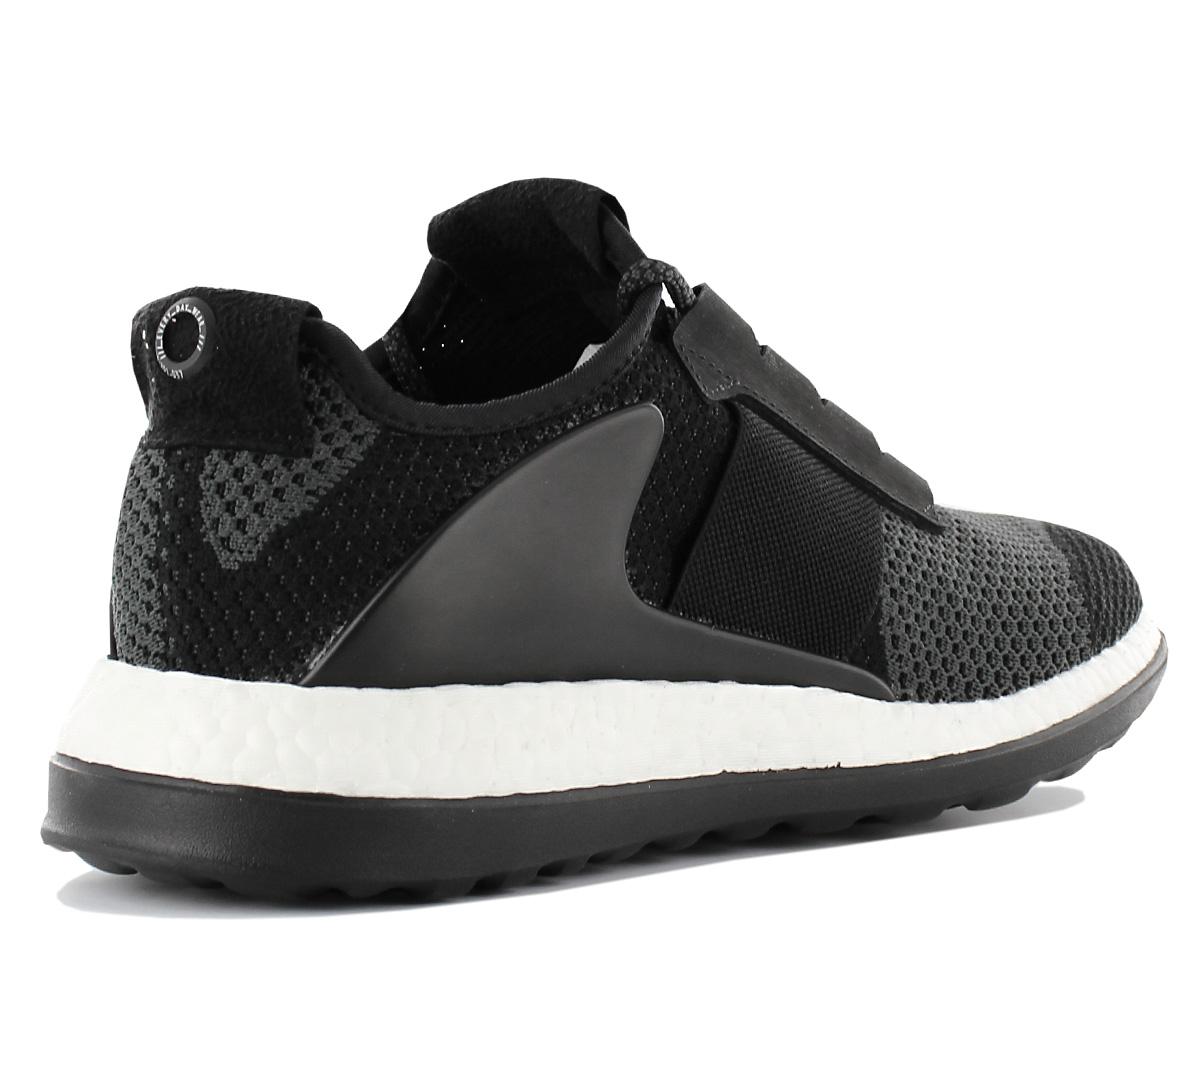 e058b81b937 Adidas Consortium Ado Pureboost Boost Zg Day One Edition Men s Shoes ...